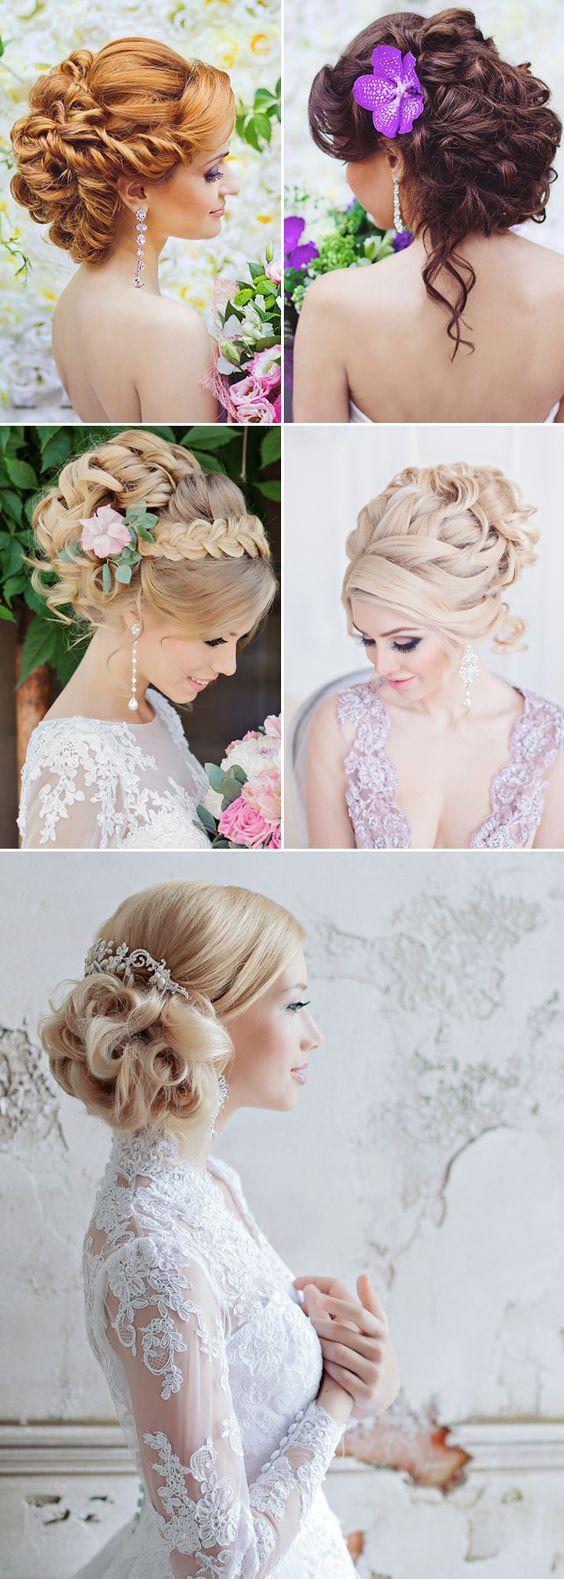 30 ROMANTIC WEDDING HAIRSTYLES FOR LONG HAIR   Elegant Hairstyle ...